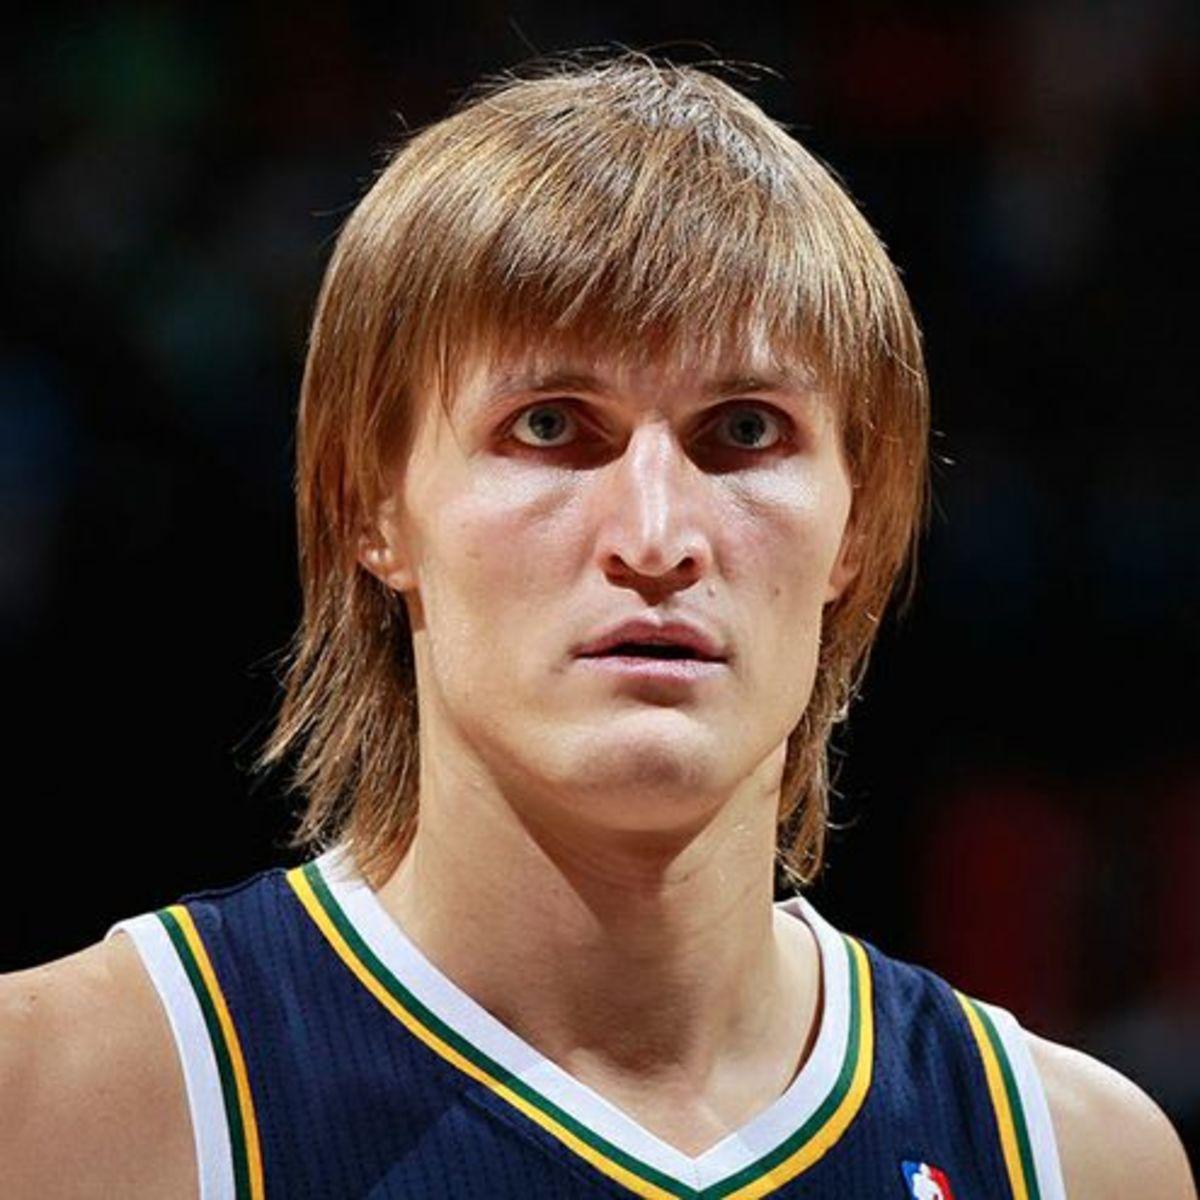 Andrei-Kirilenko-haircut